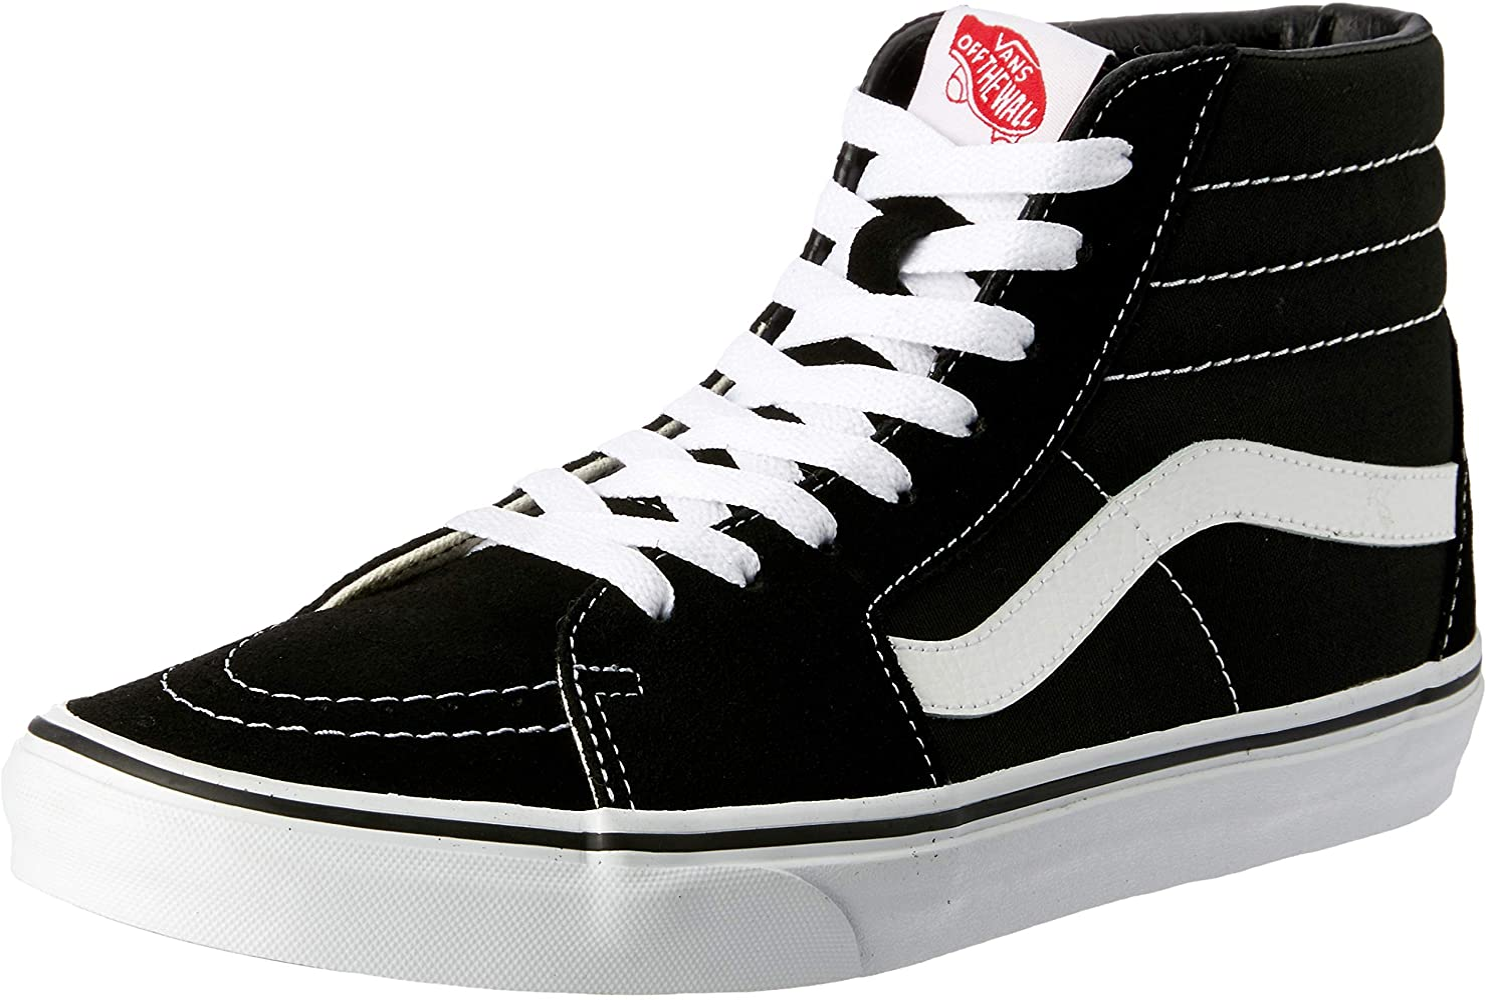 Vans SK8-HI Skate Sneakers Shoes Unisex Black high-Necked